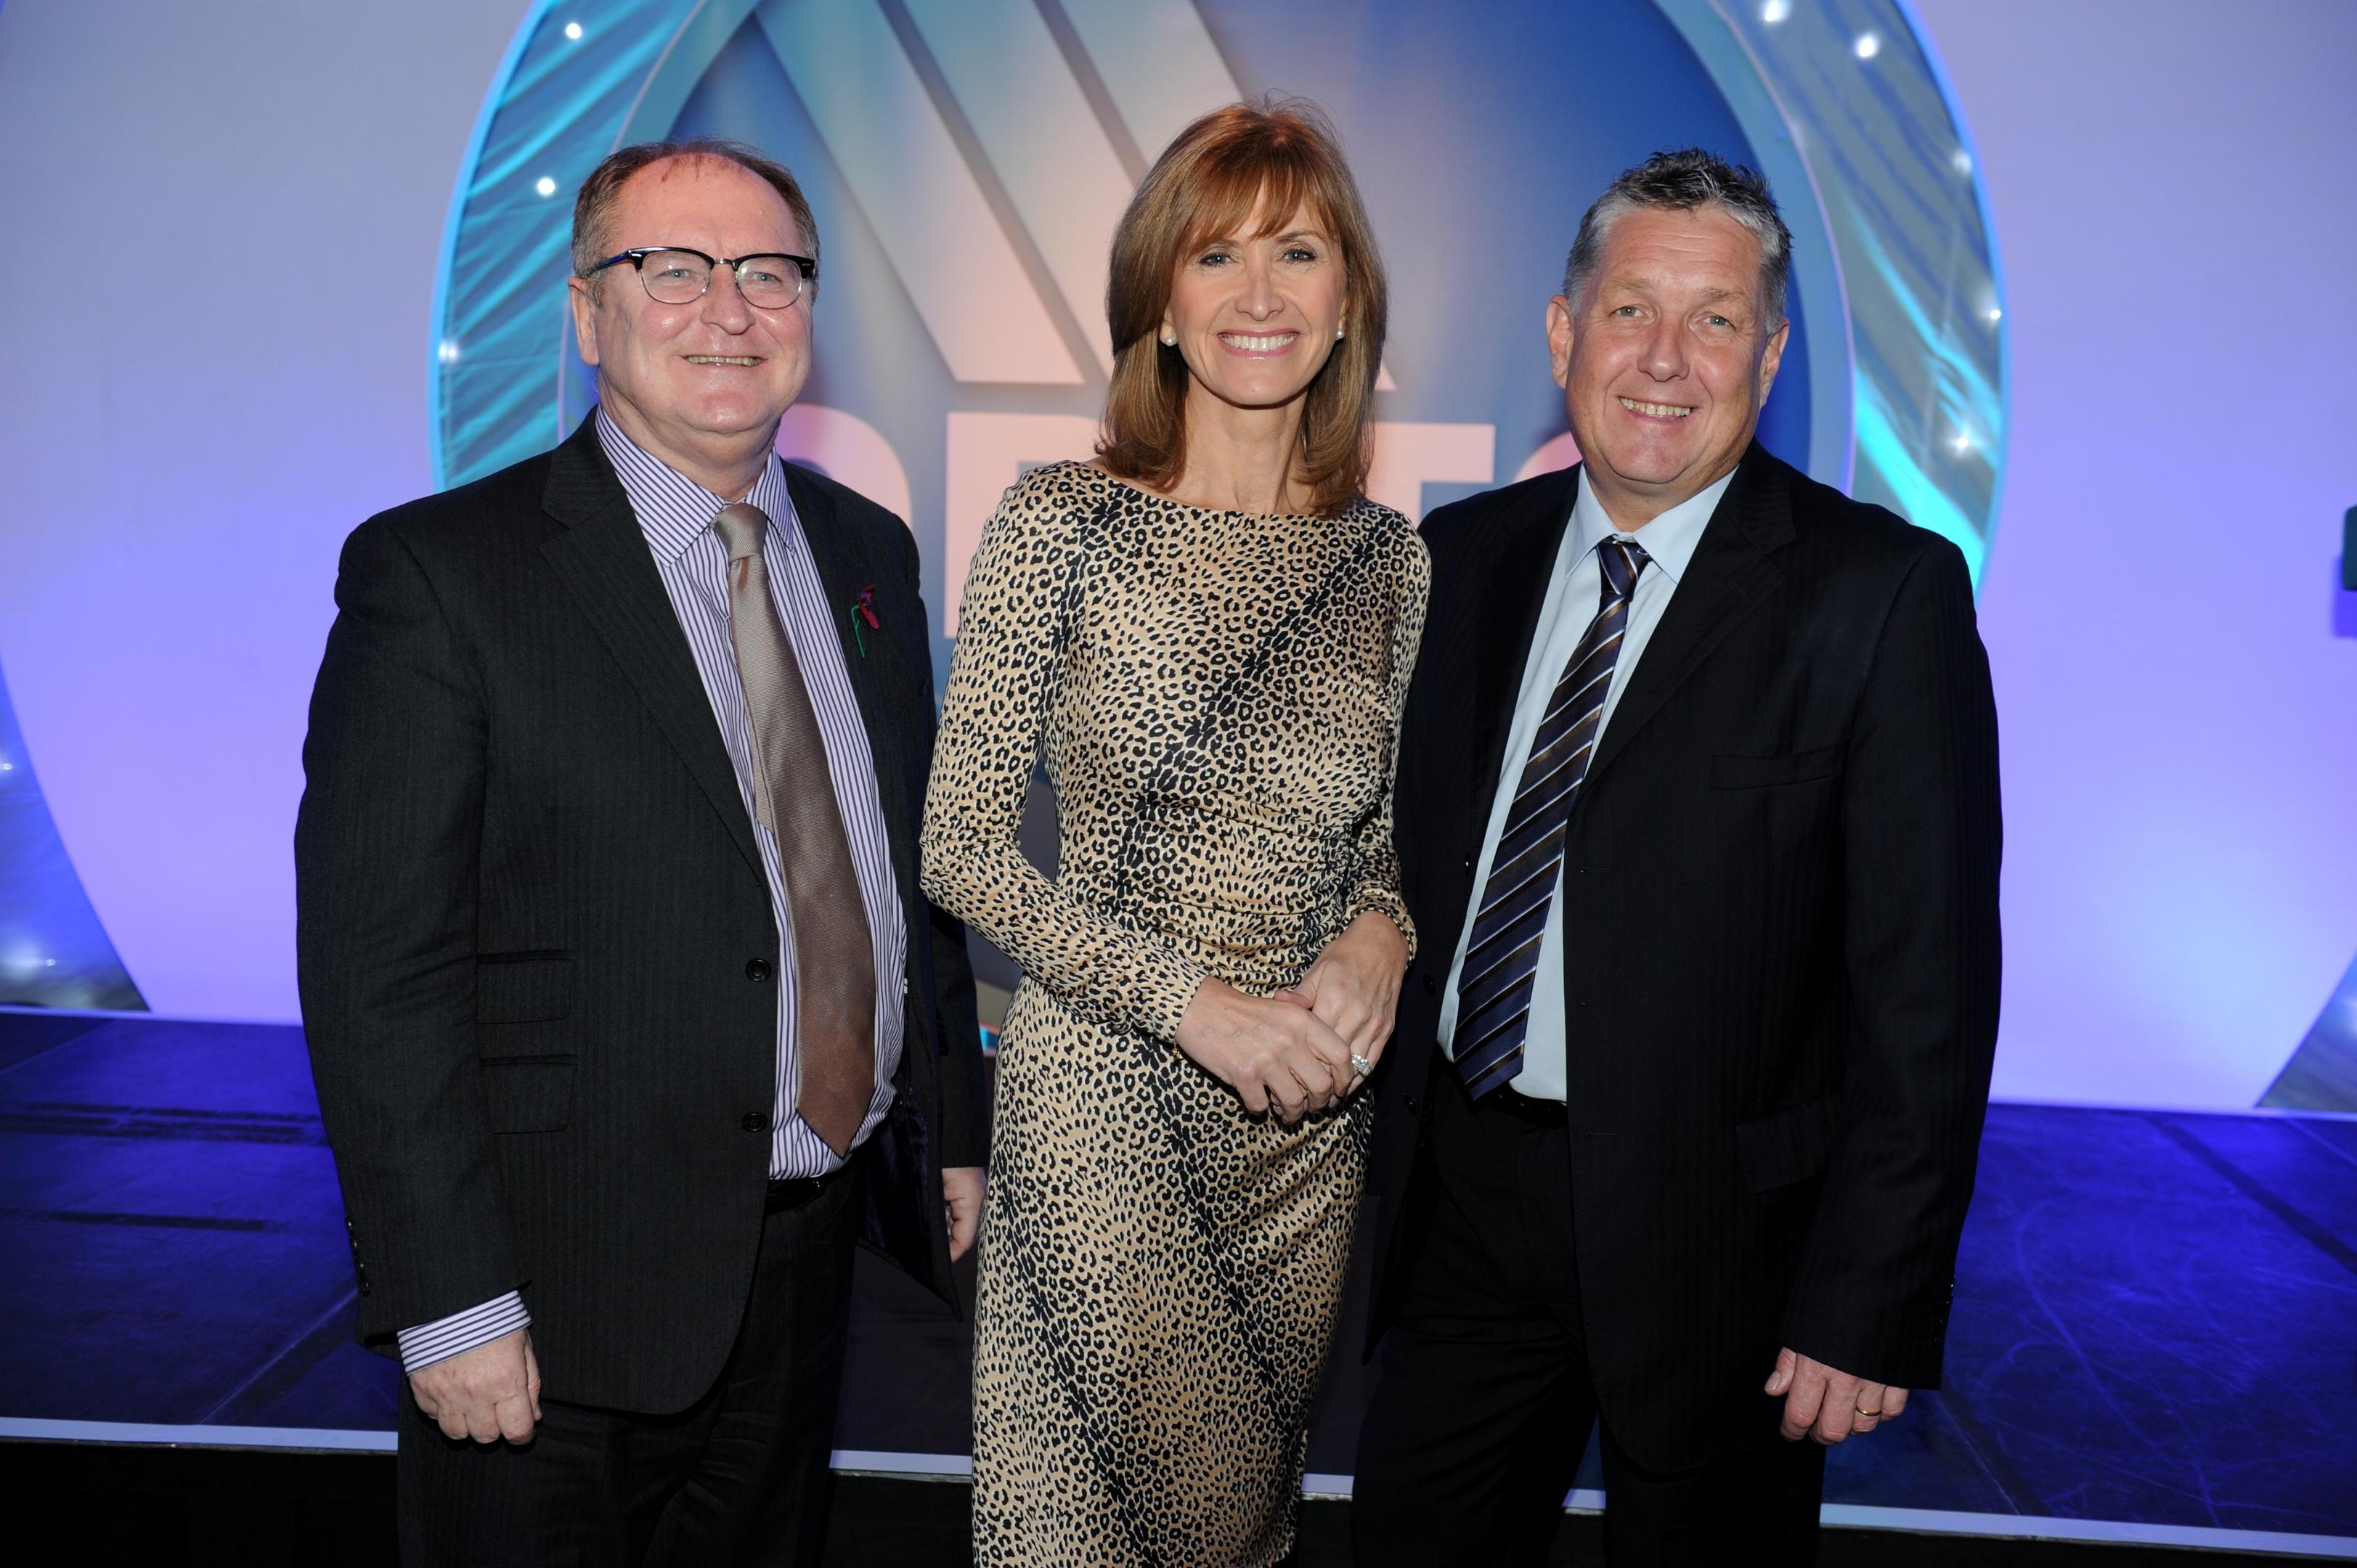 Managing director of Opito, John McDonald with broadcaster Jackie Bird and chief executive David Doig